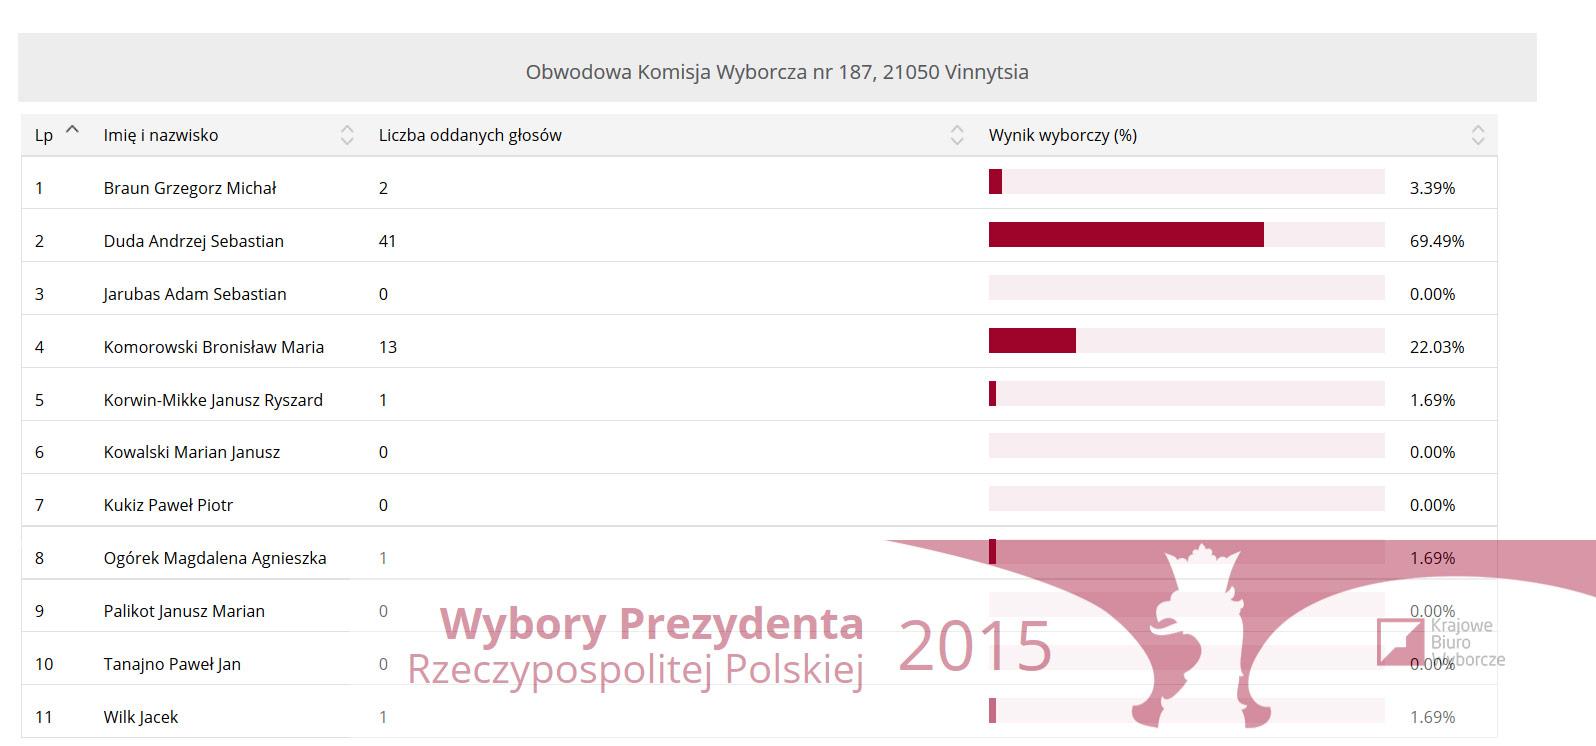 Źródło - pkw.gov.pl